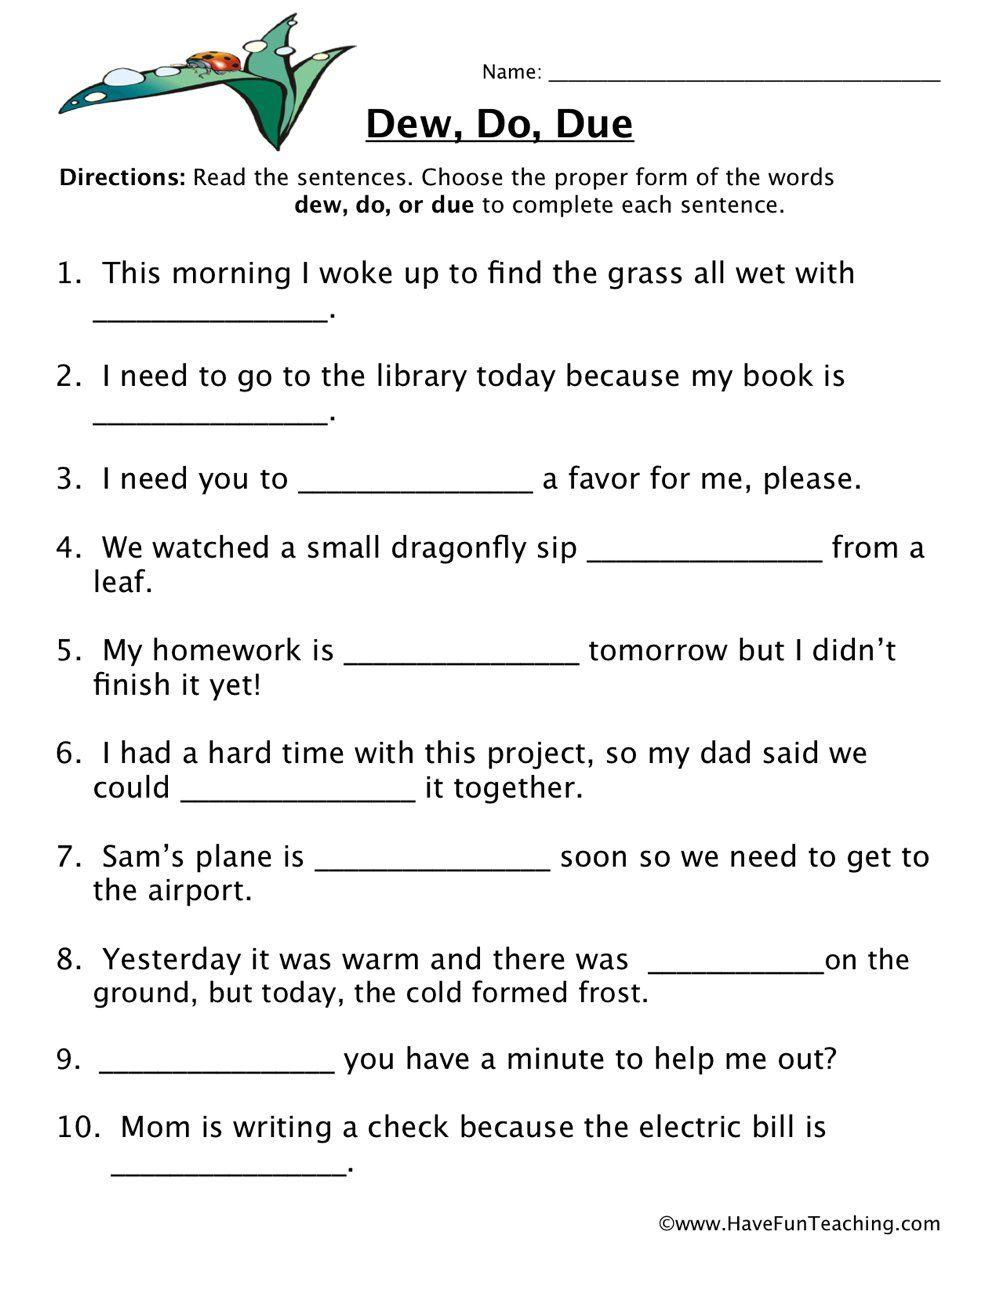 Dew Do Due Homophones Worksheet Homophones Worksheets Have Fun Teaching Homophones